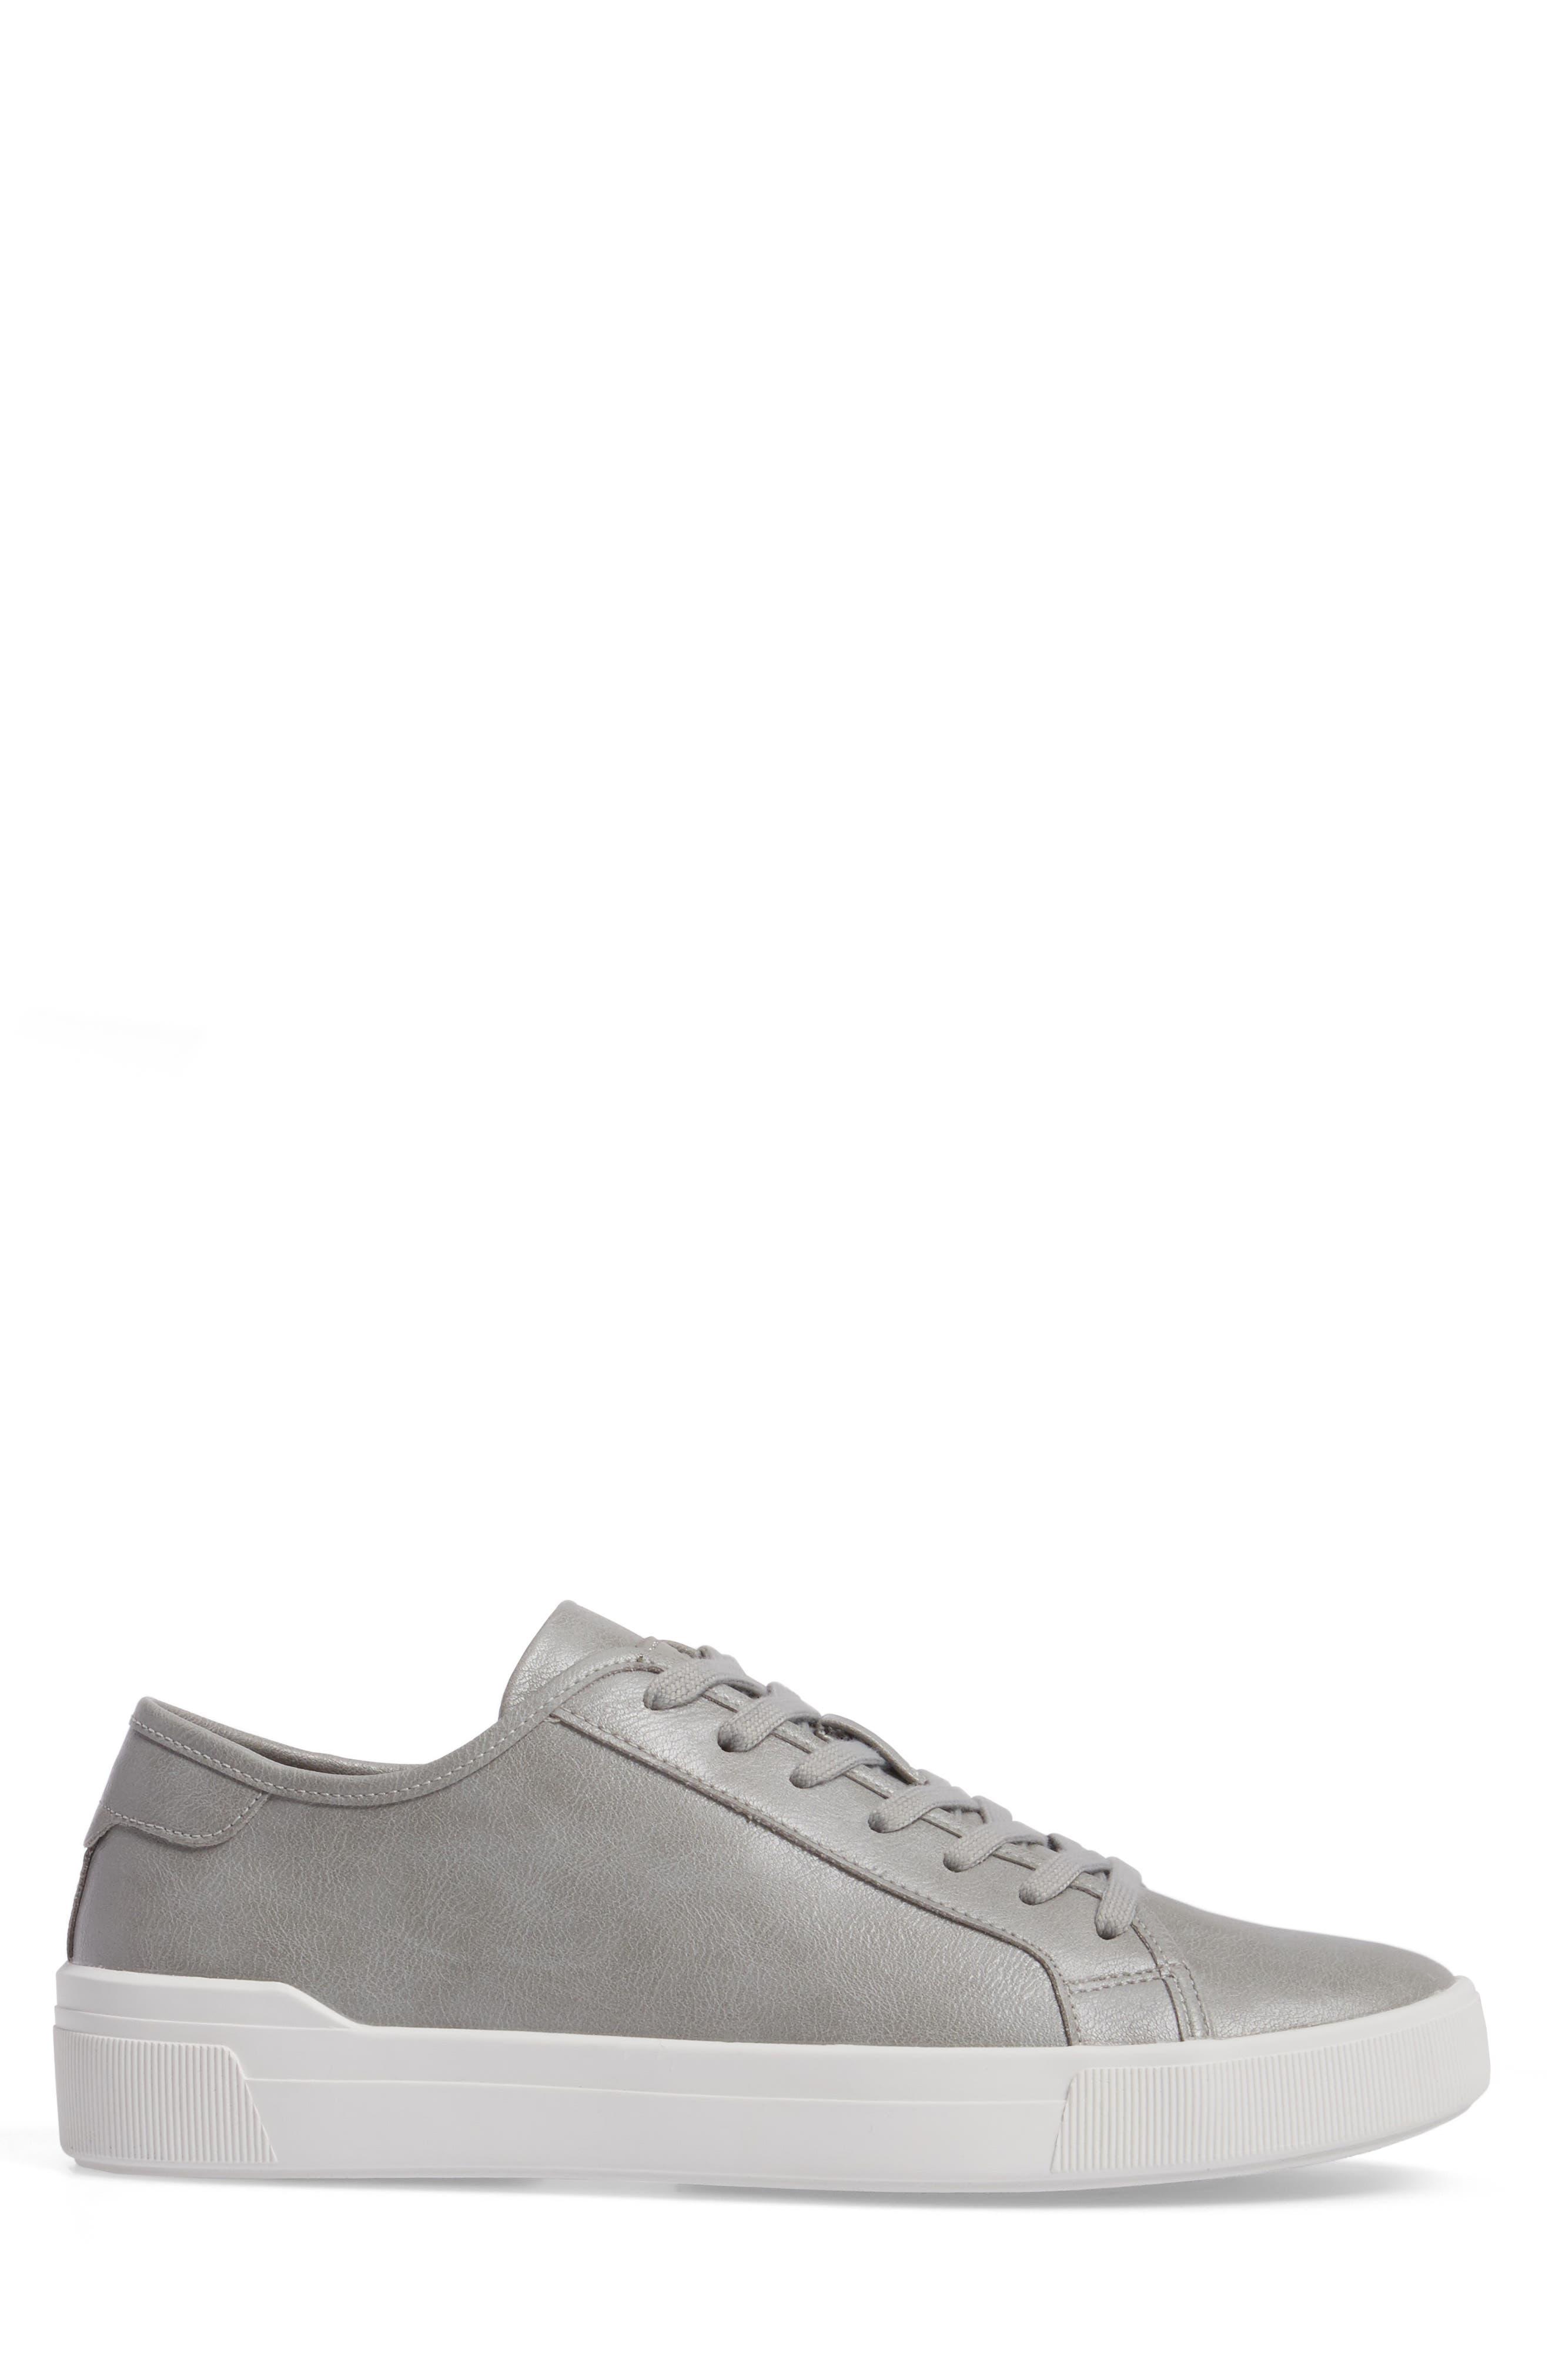 Haener Sneaker,                             Alternate thumbnail 3, color,                             Medium Grey